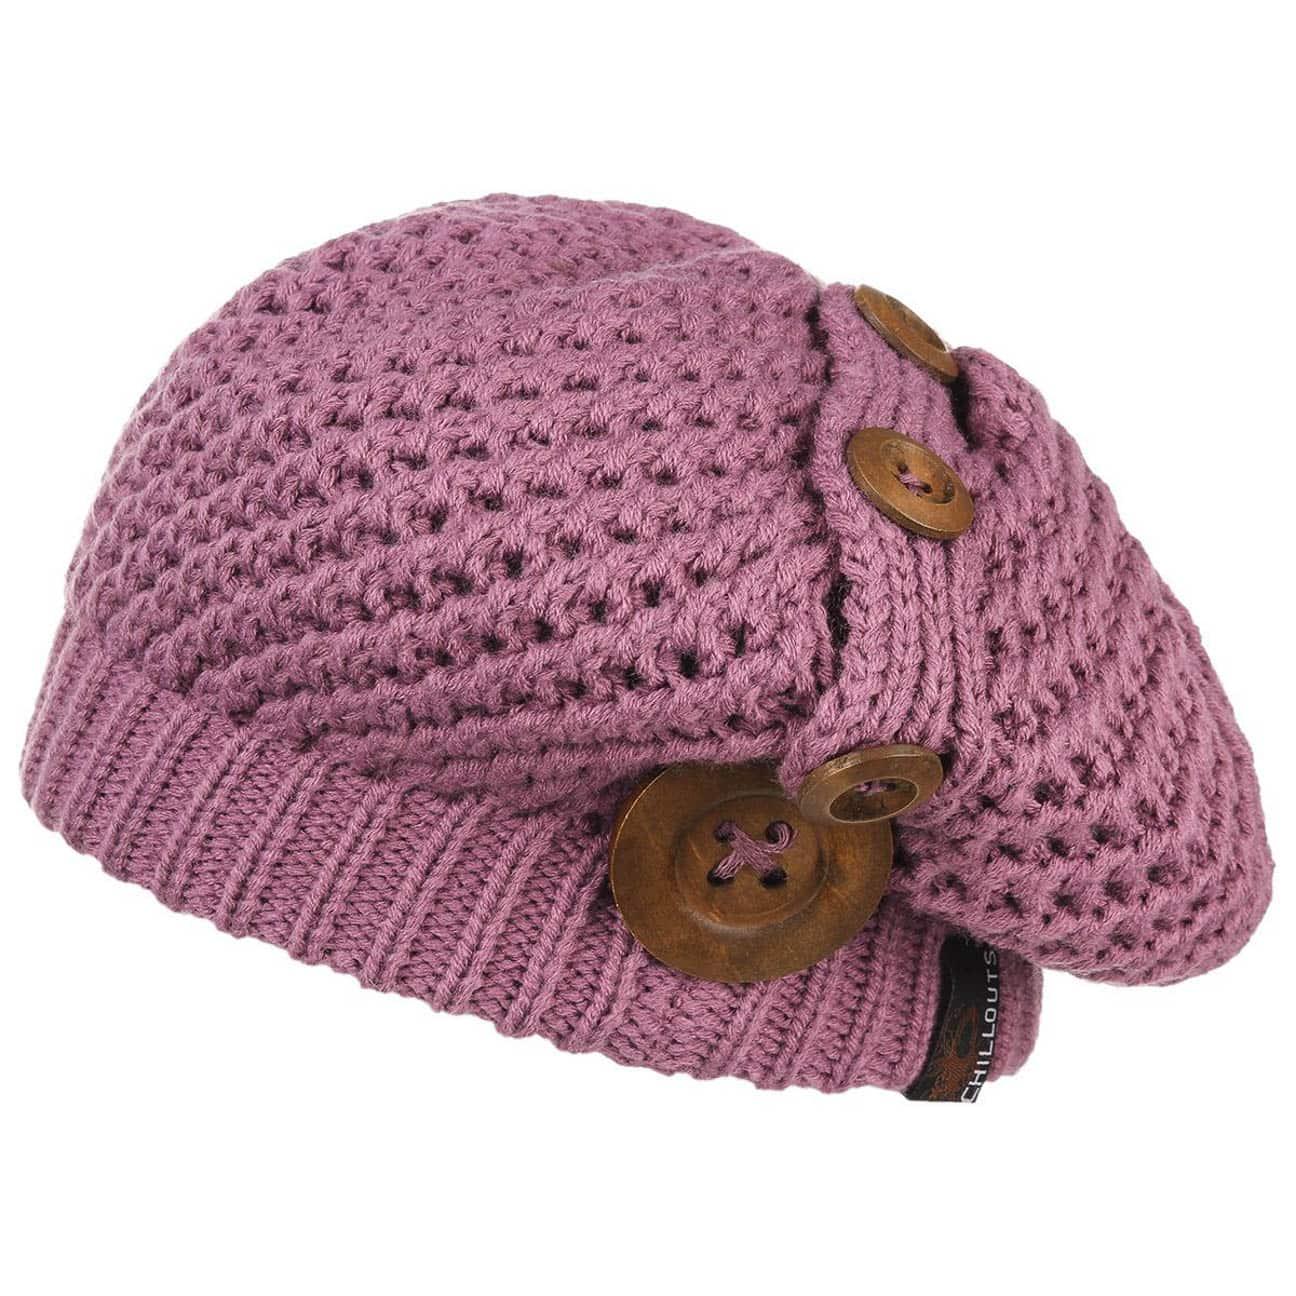 Boina Vasca de Punto Nelly by Chillouts - Gorros - sombreroshop.es 13b705bb715